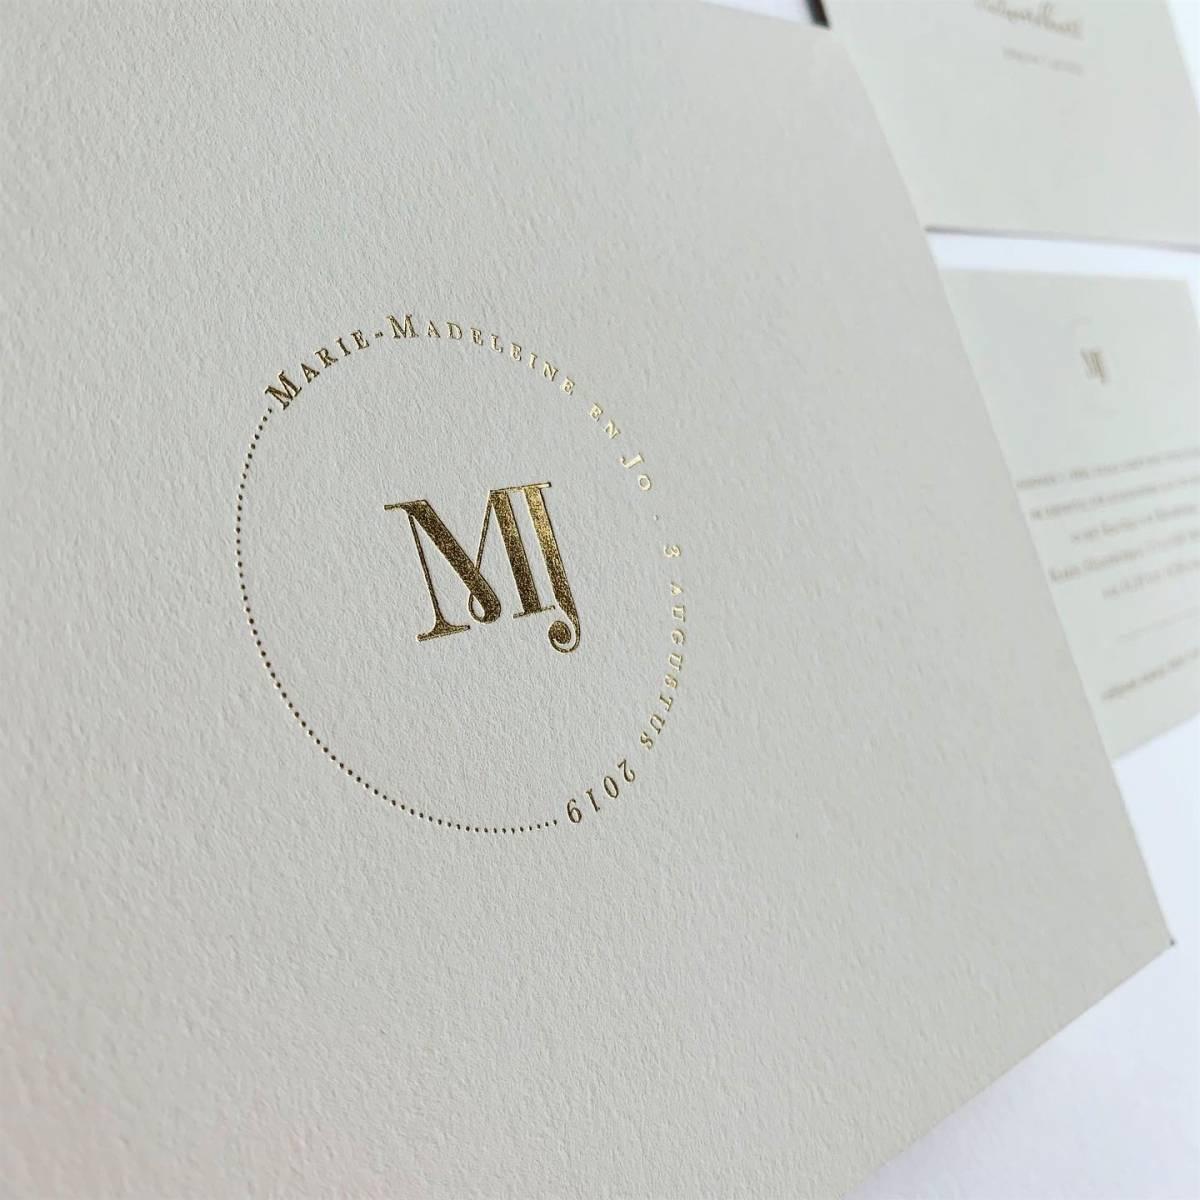 Scarabar - Trouwuitnodiging - Huwelijksuitnodiging - Drukwerk - Huwelijk - Trouw - Bruiloft - House of Weddings - 45